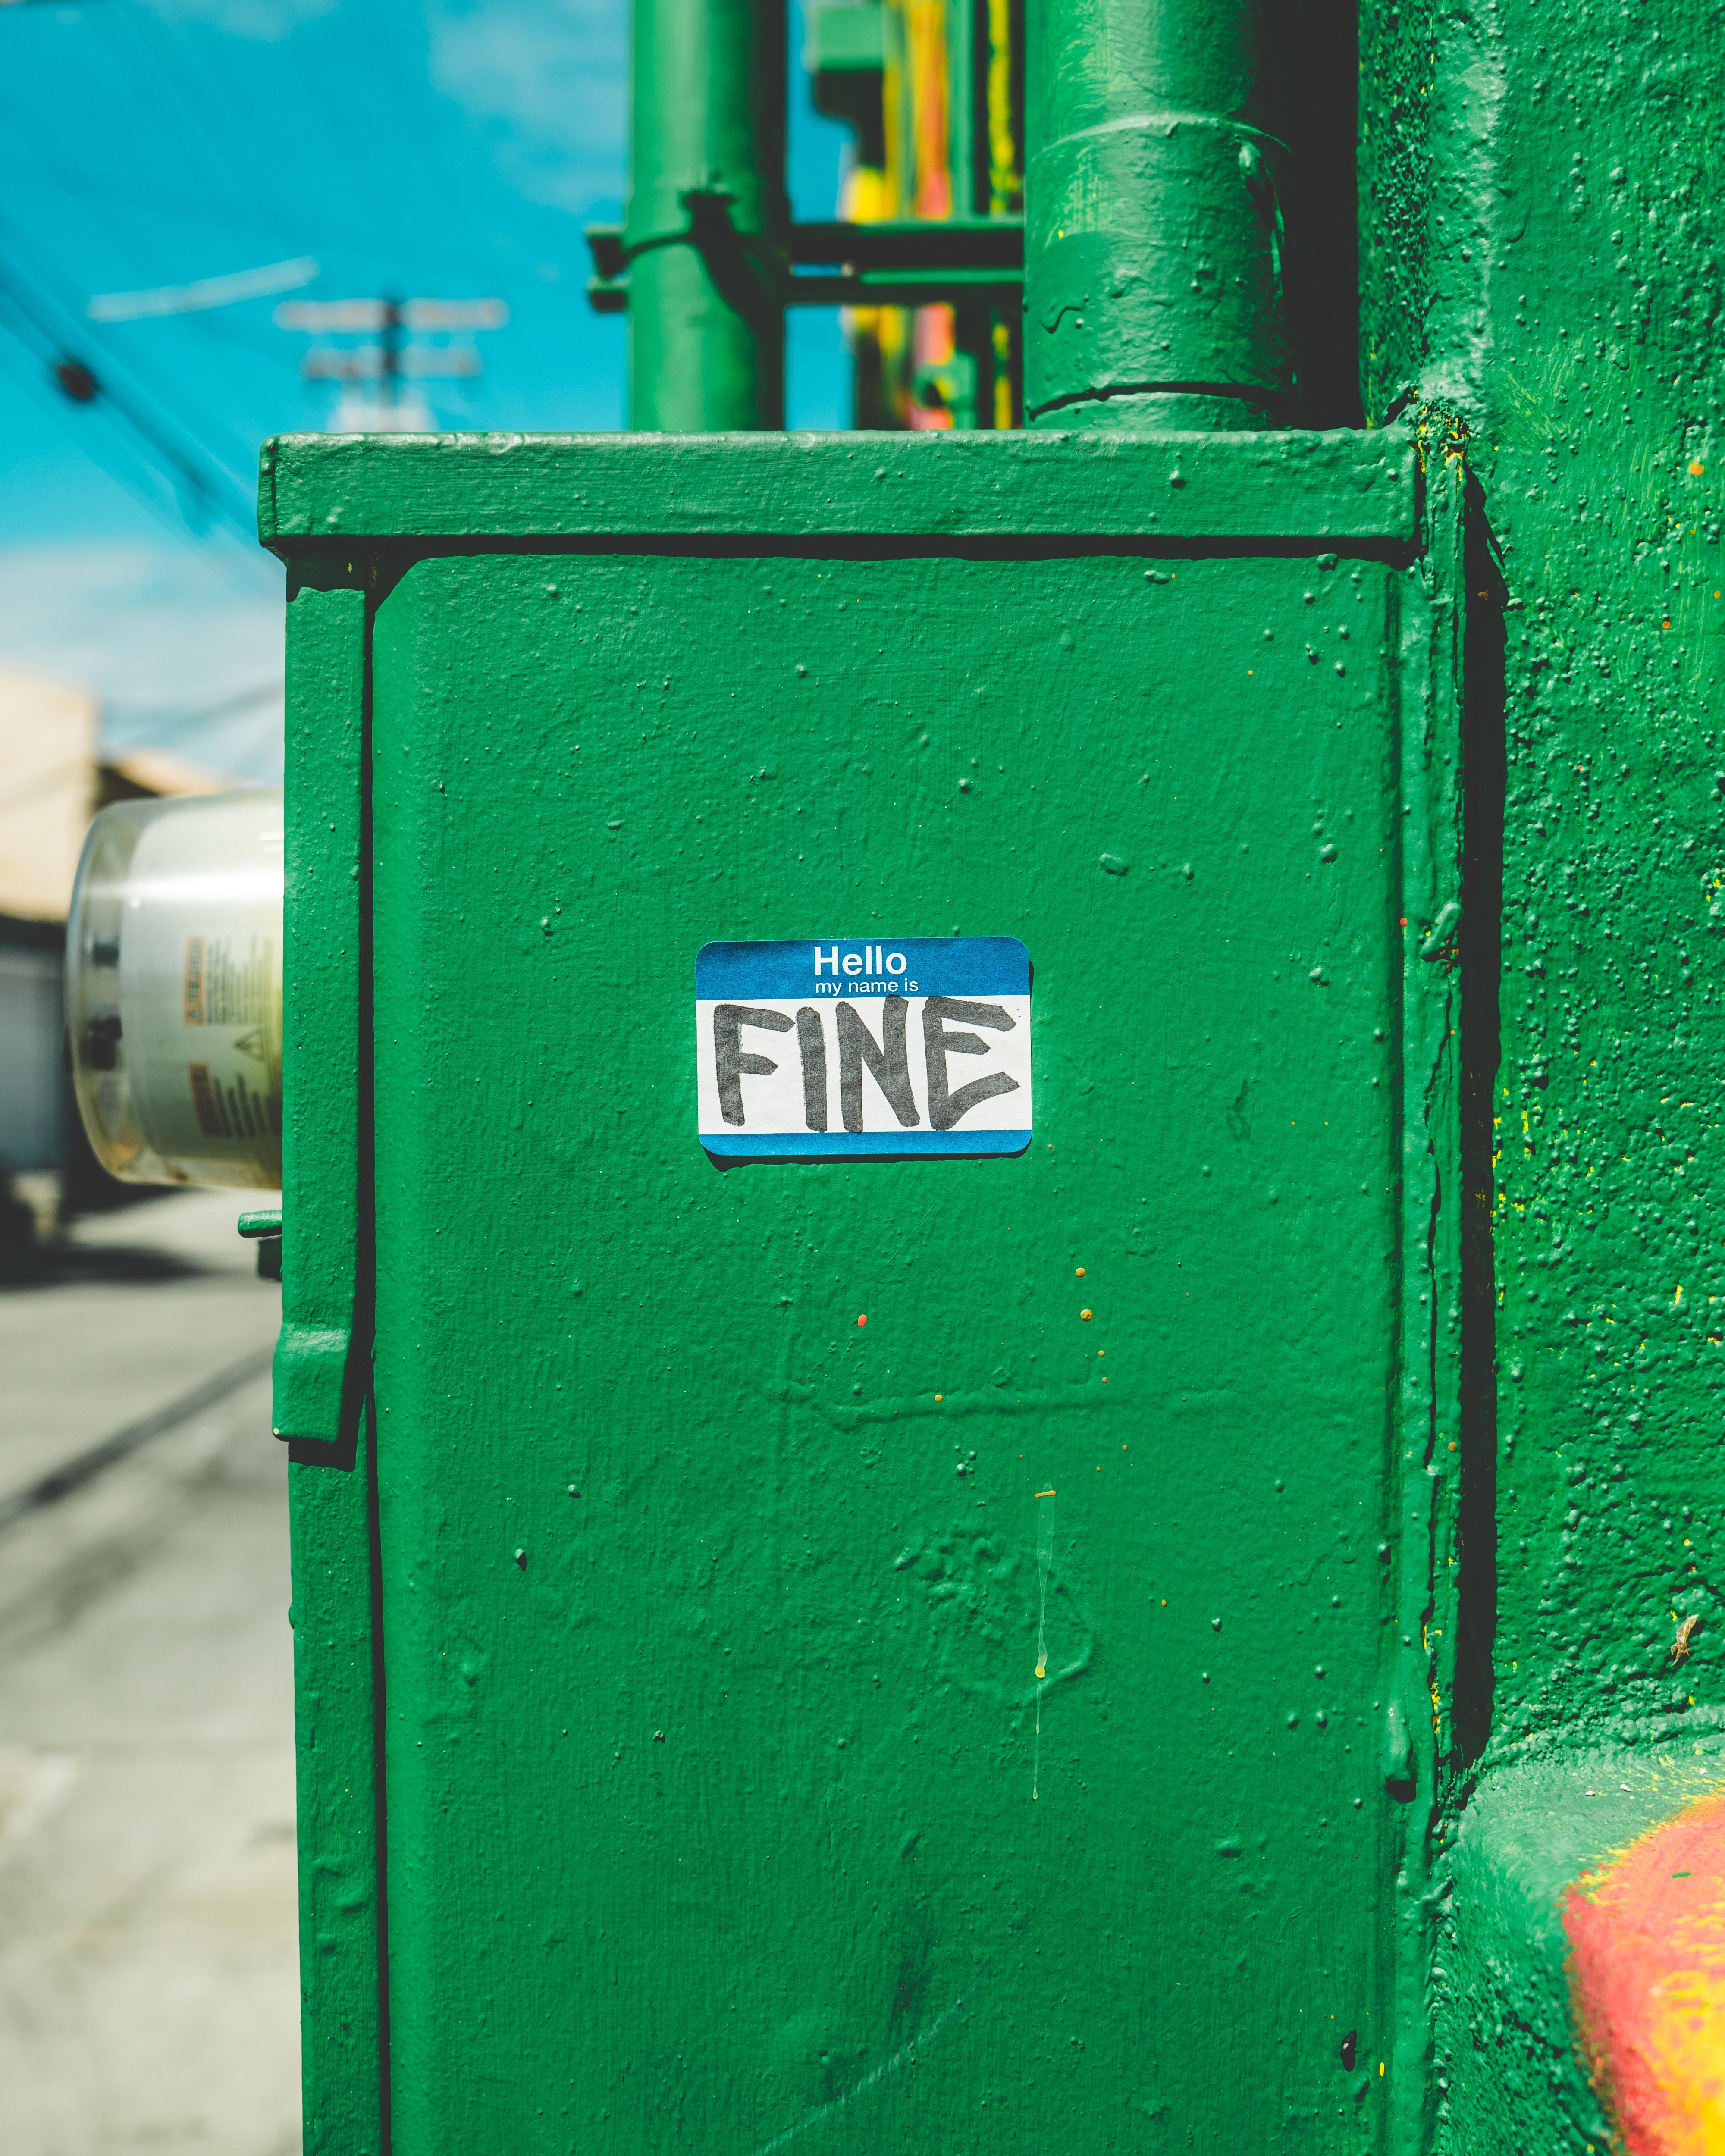 green steel box with fine-printed sticker